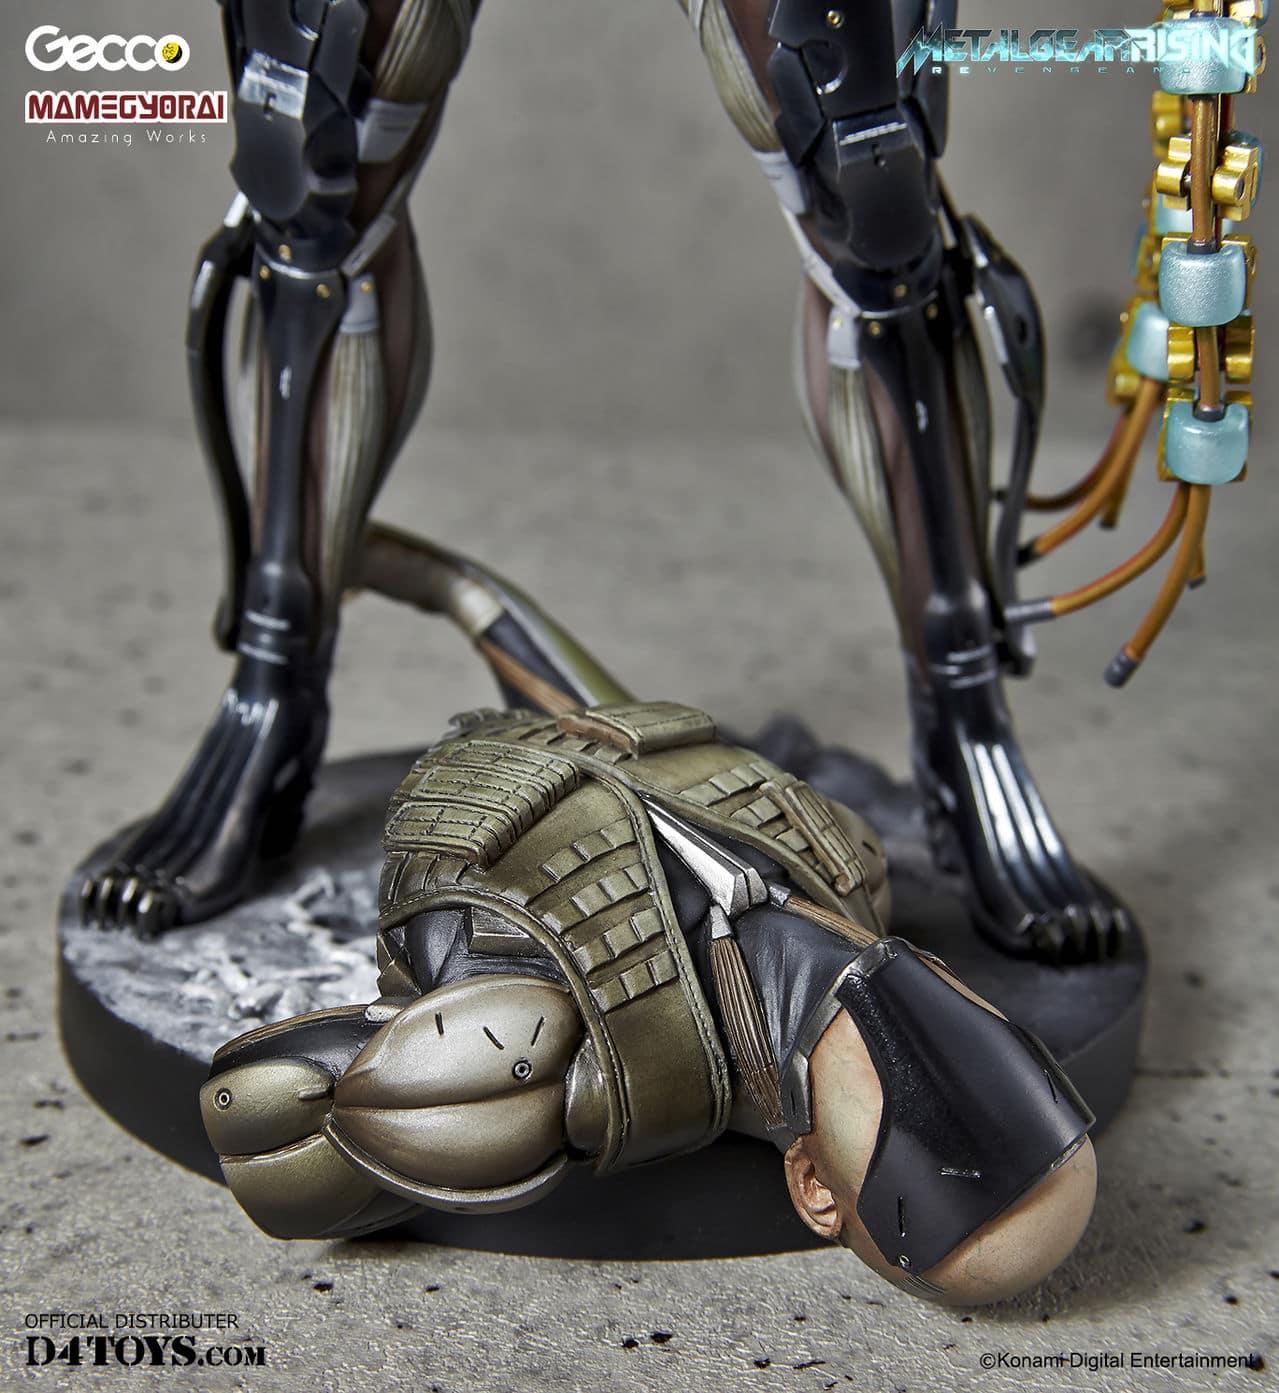 [Gecco,  Mamegyorai] Metal Gear Rising: Revengeance - RAIDEN White Armor 1/6 - SDCC2015 Exclusive - Página 2 D4_019